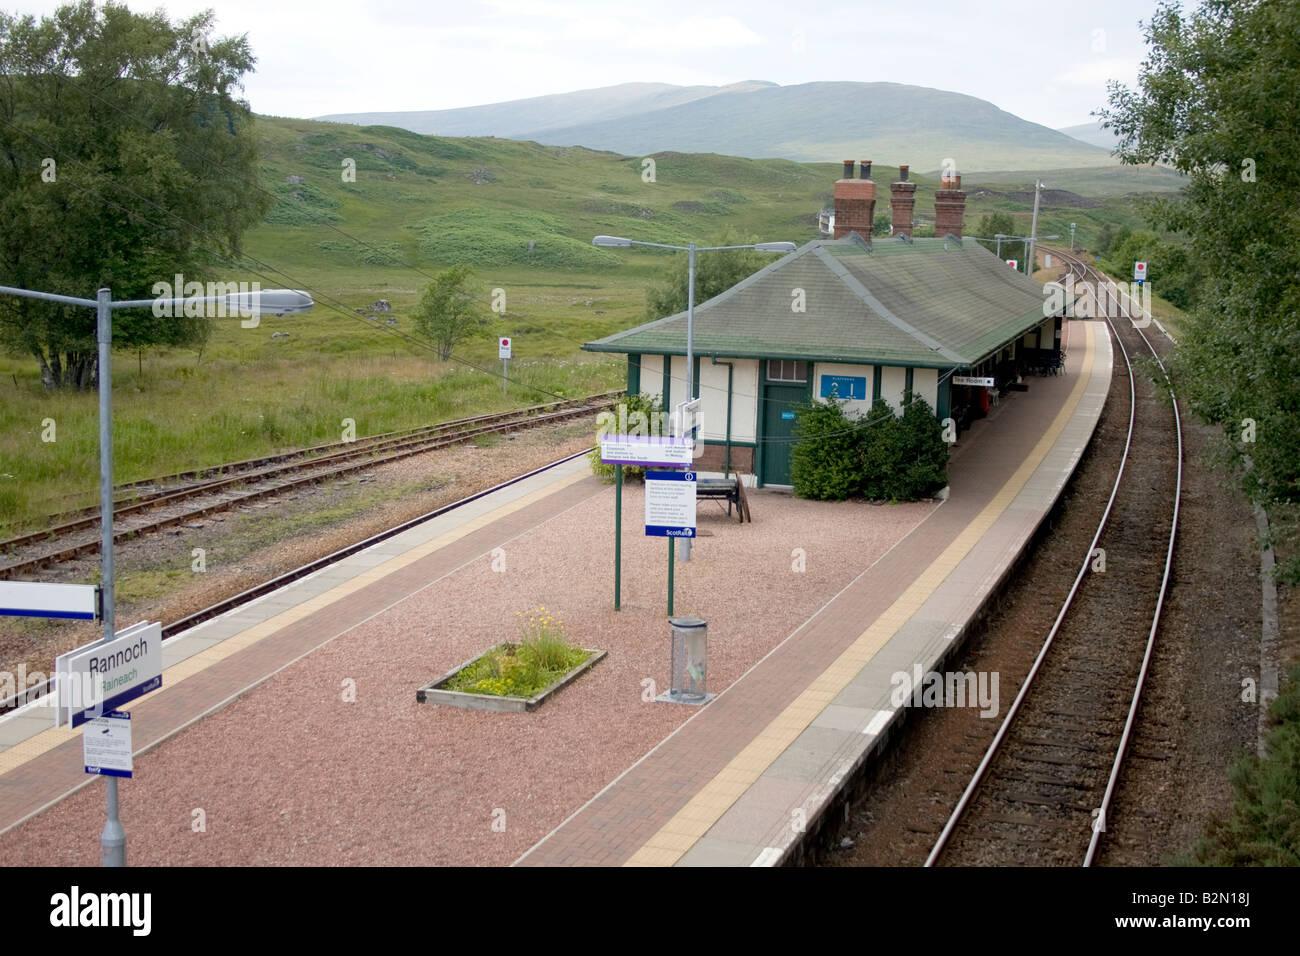 Rannoch Railway Station Platform And Sign On Moor In Perth Kinross Scotland